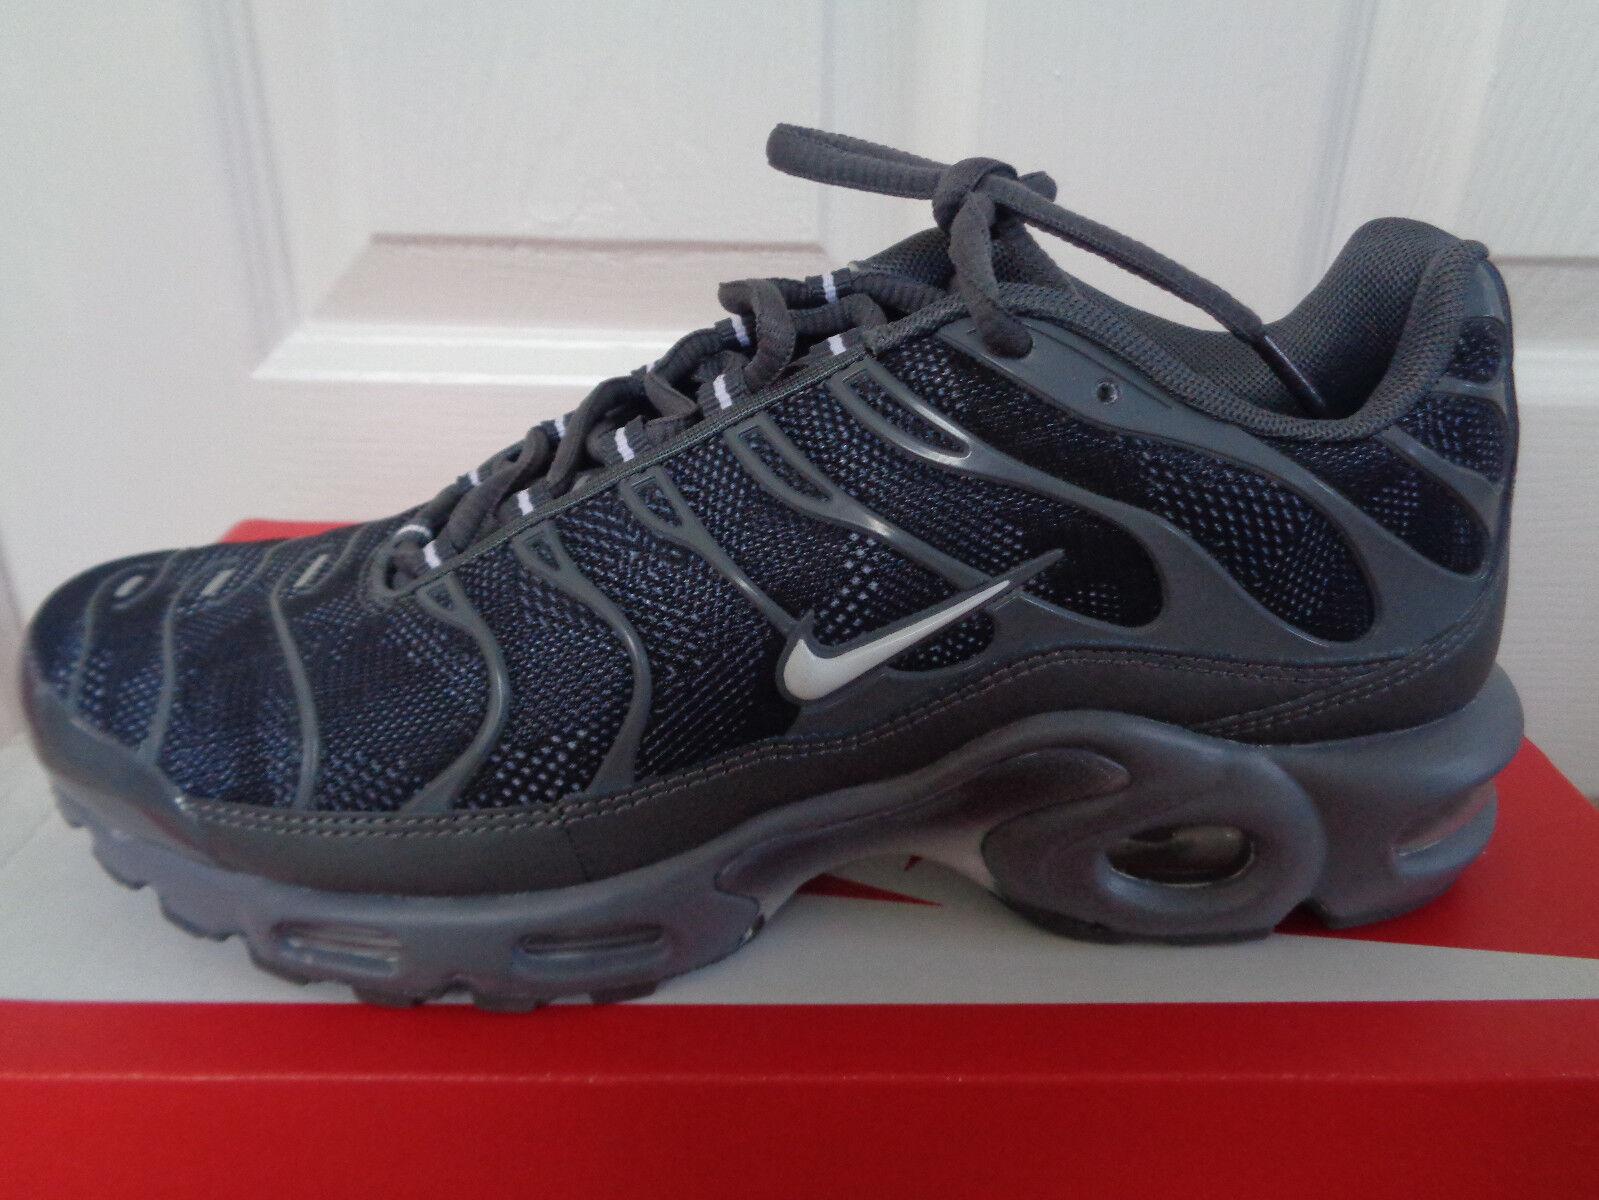 Nike Air max plus GPX trainers Turnschuhe 844873 004 uk 6 eu 40 us 7 NEWBOX    | Neuheit Spielzeug